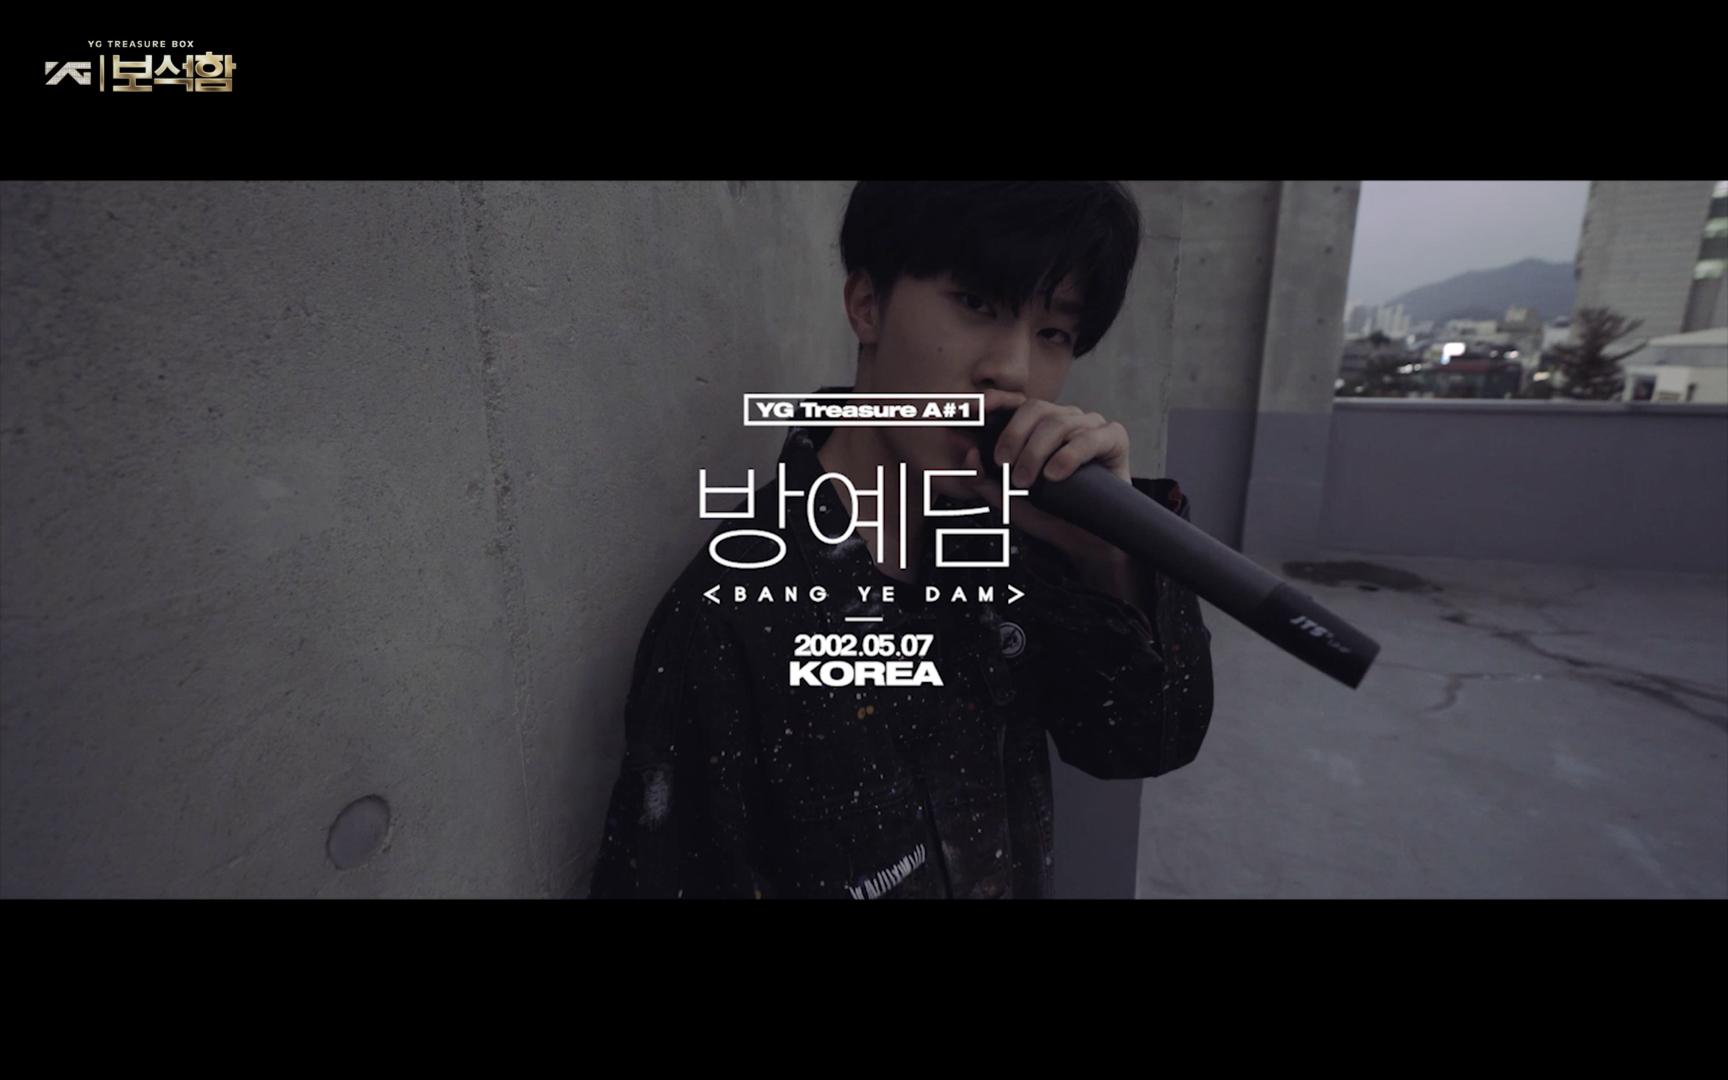 YG보석함ㅣ#인터뷰+퍼포먼스_TREASURE A#1 방예담 <BANG YE DAM>